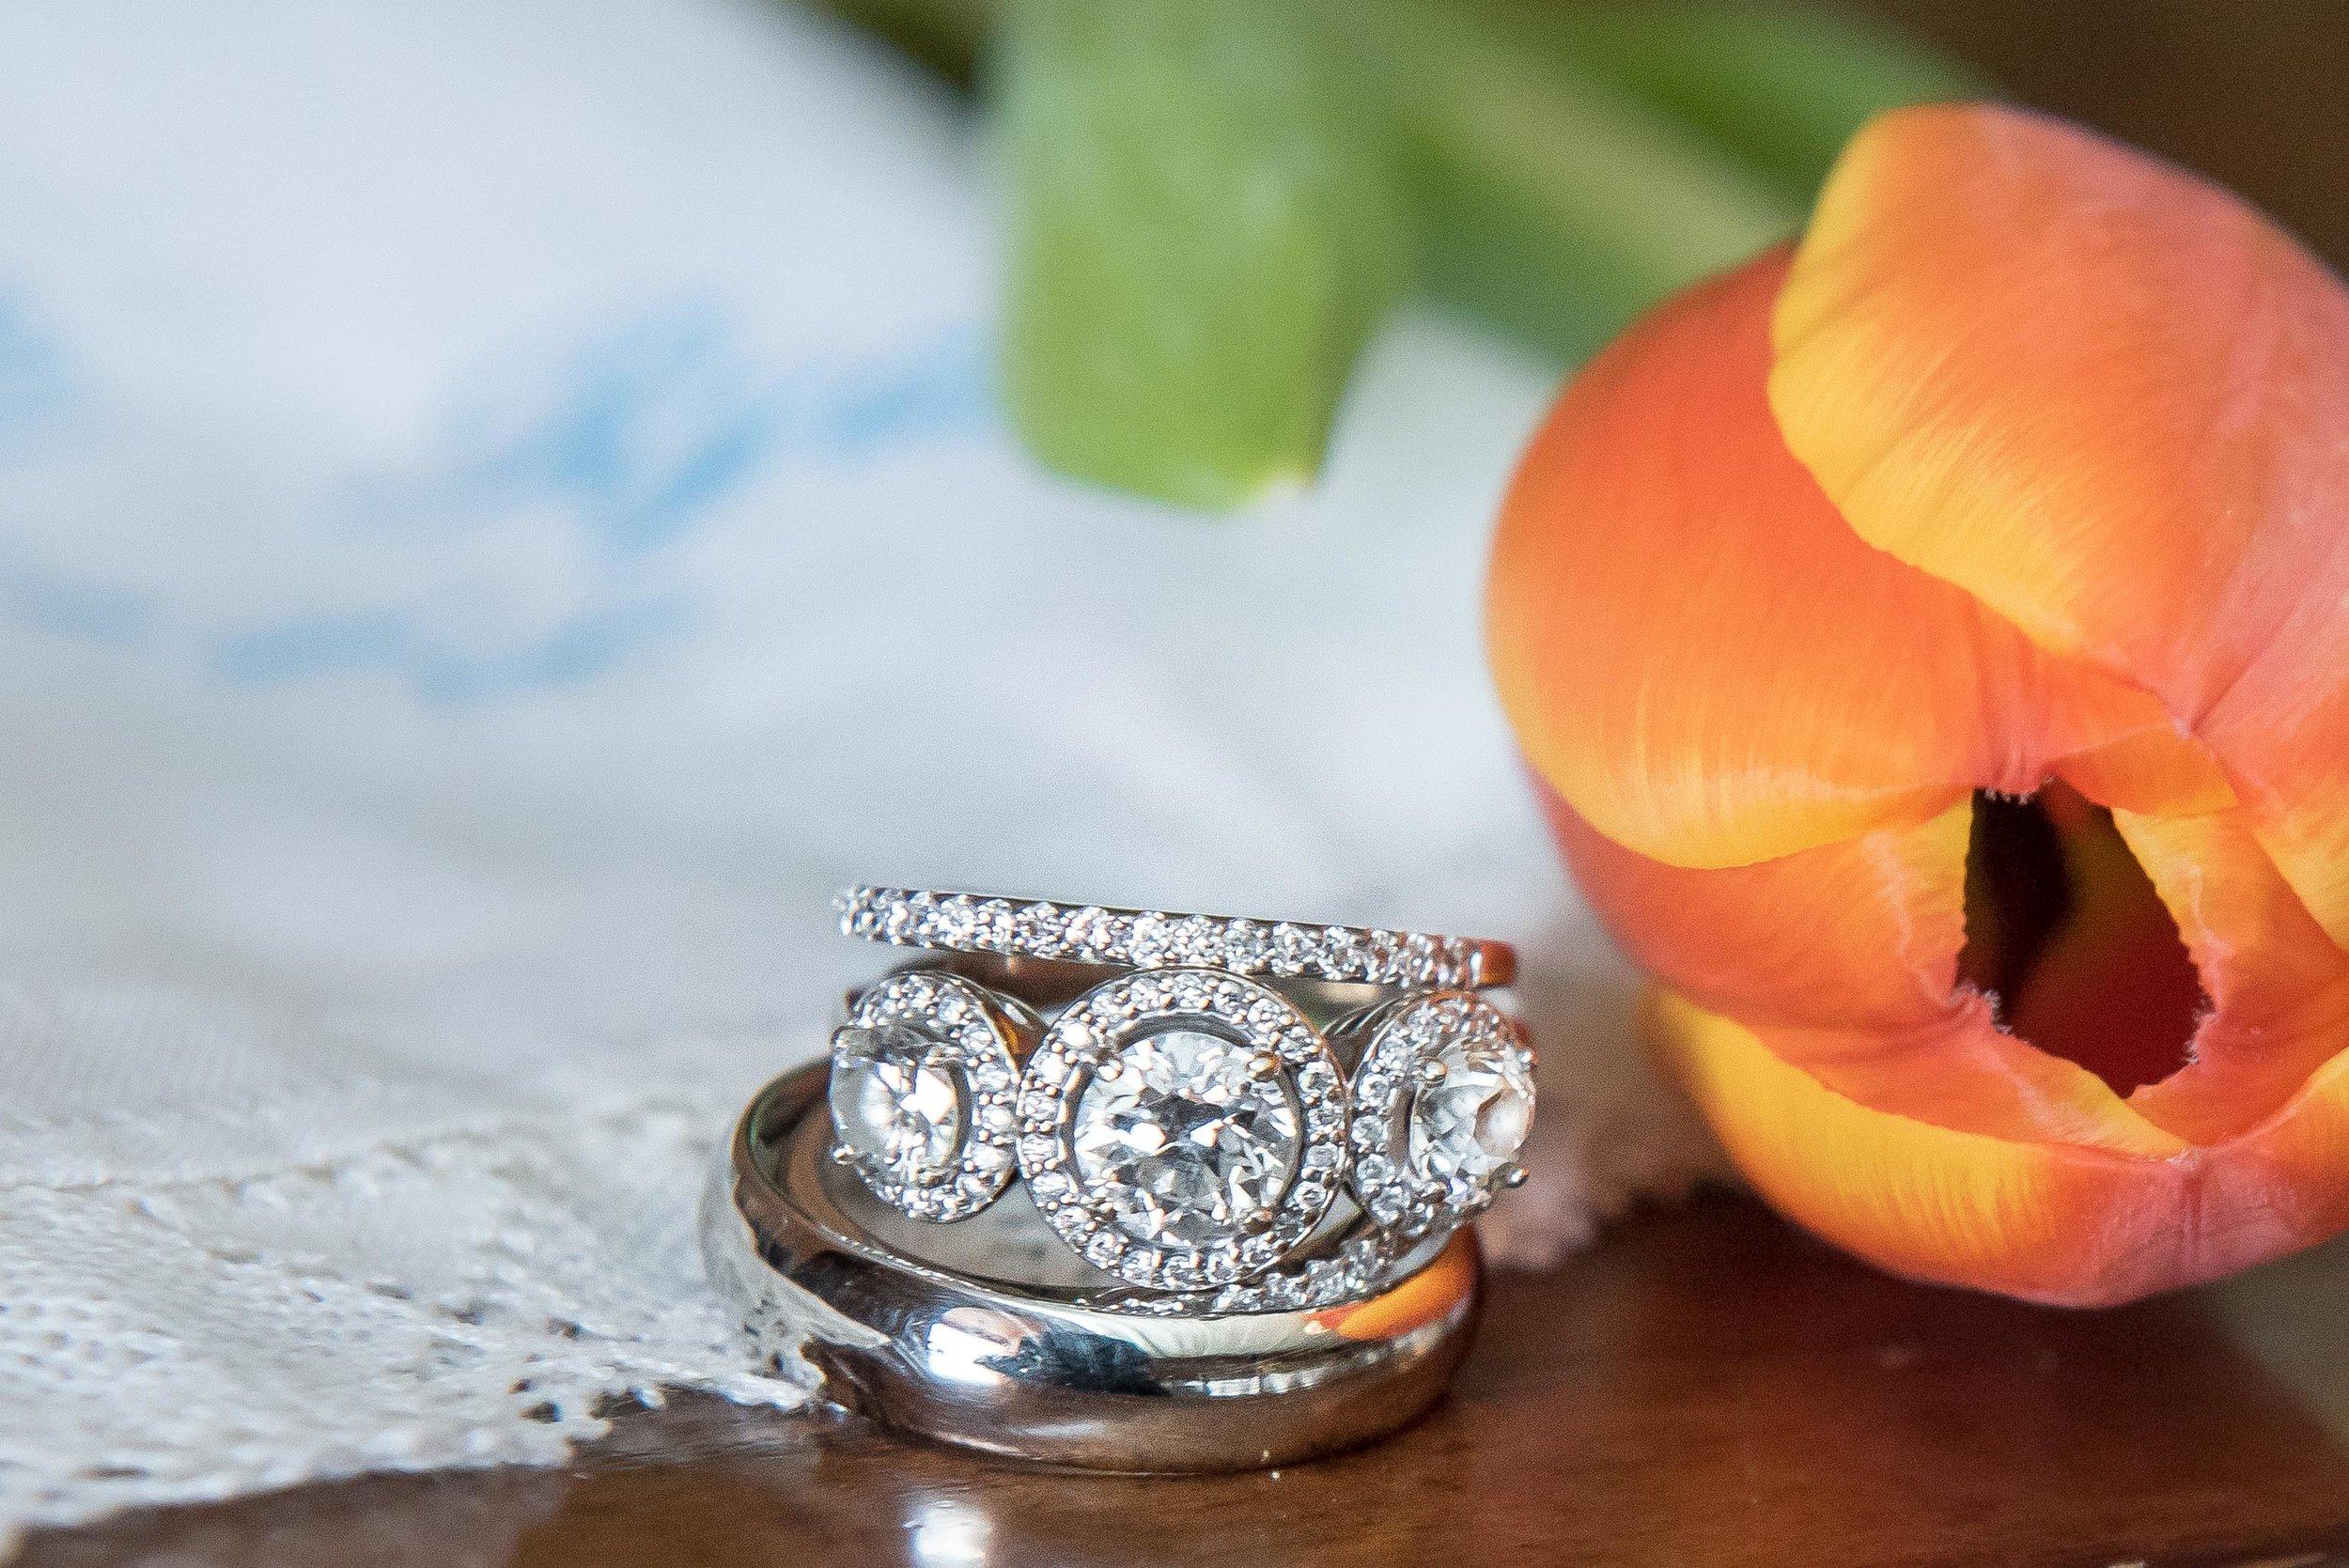 Adaumont Farm - Adaumont Farm Weddings - Trinity Weddings - NC Weddings - Yasmin Leonard Photography-4.jpg